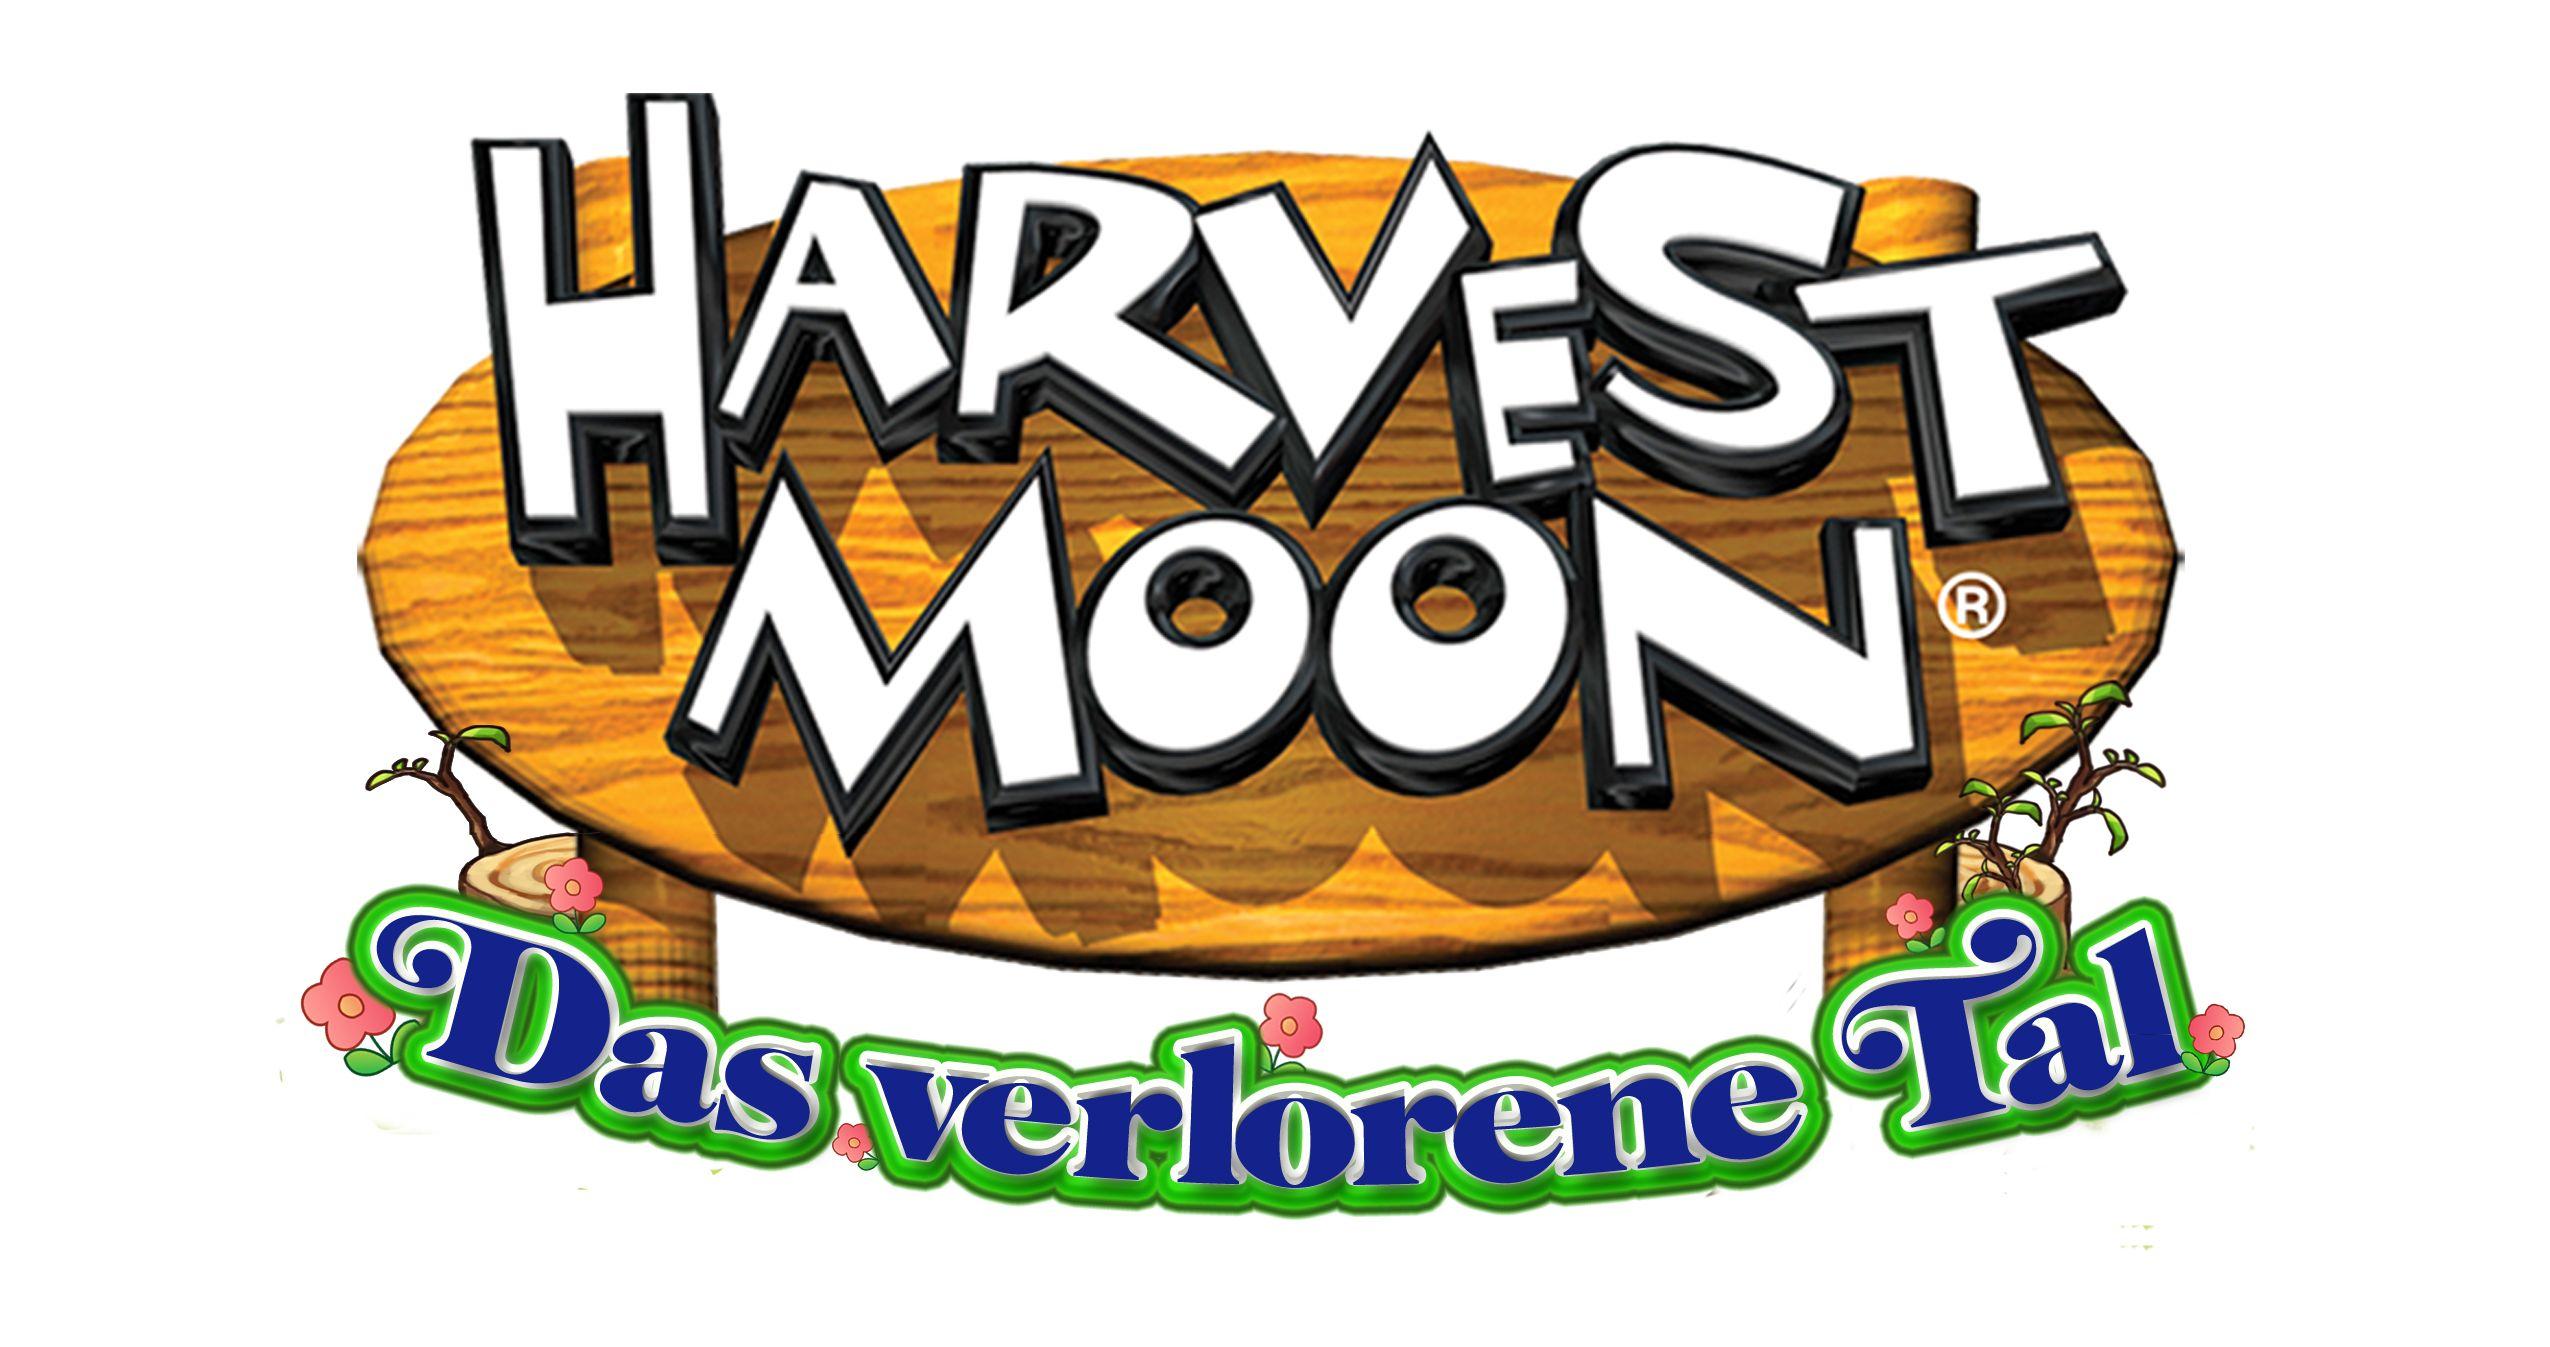 harvest moon das verlorene tal titel 3ds bild